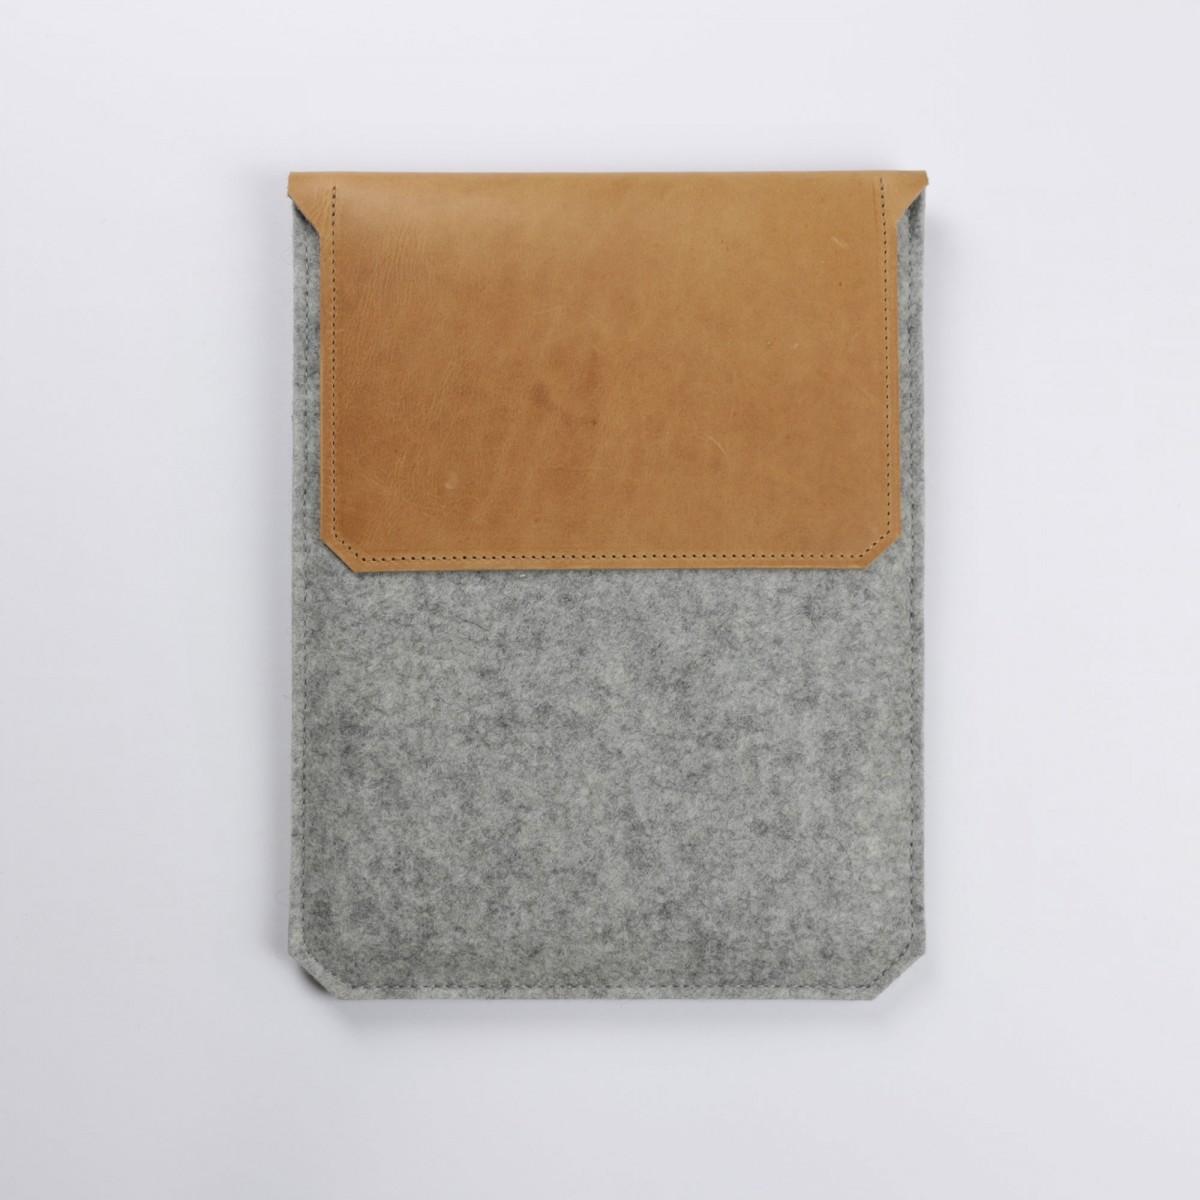 Alexej Nagel Hülle für iPad Air / iPad Air 2 aus Vintage Leder & Filz grau